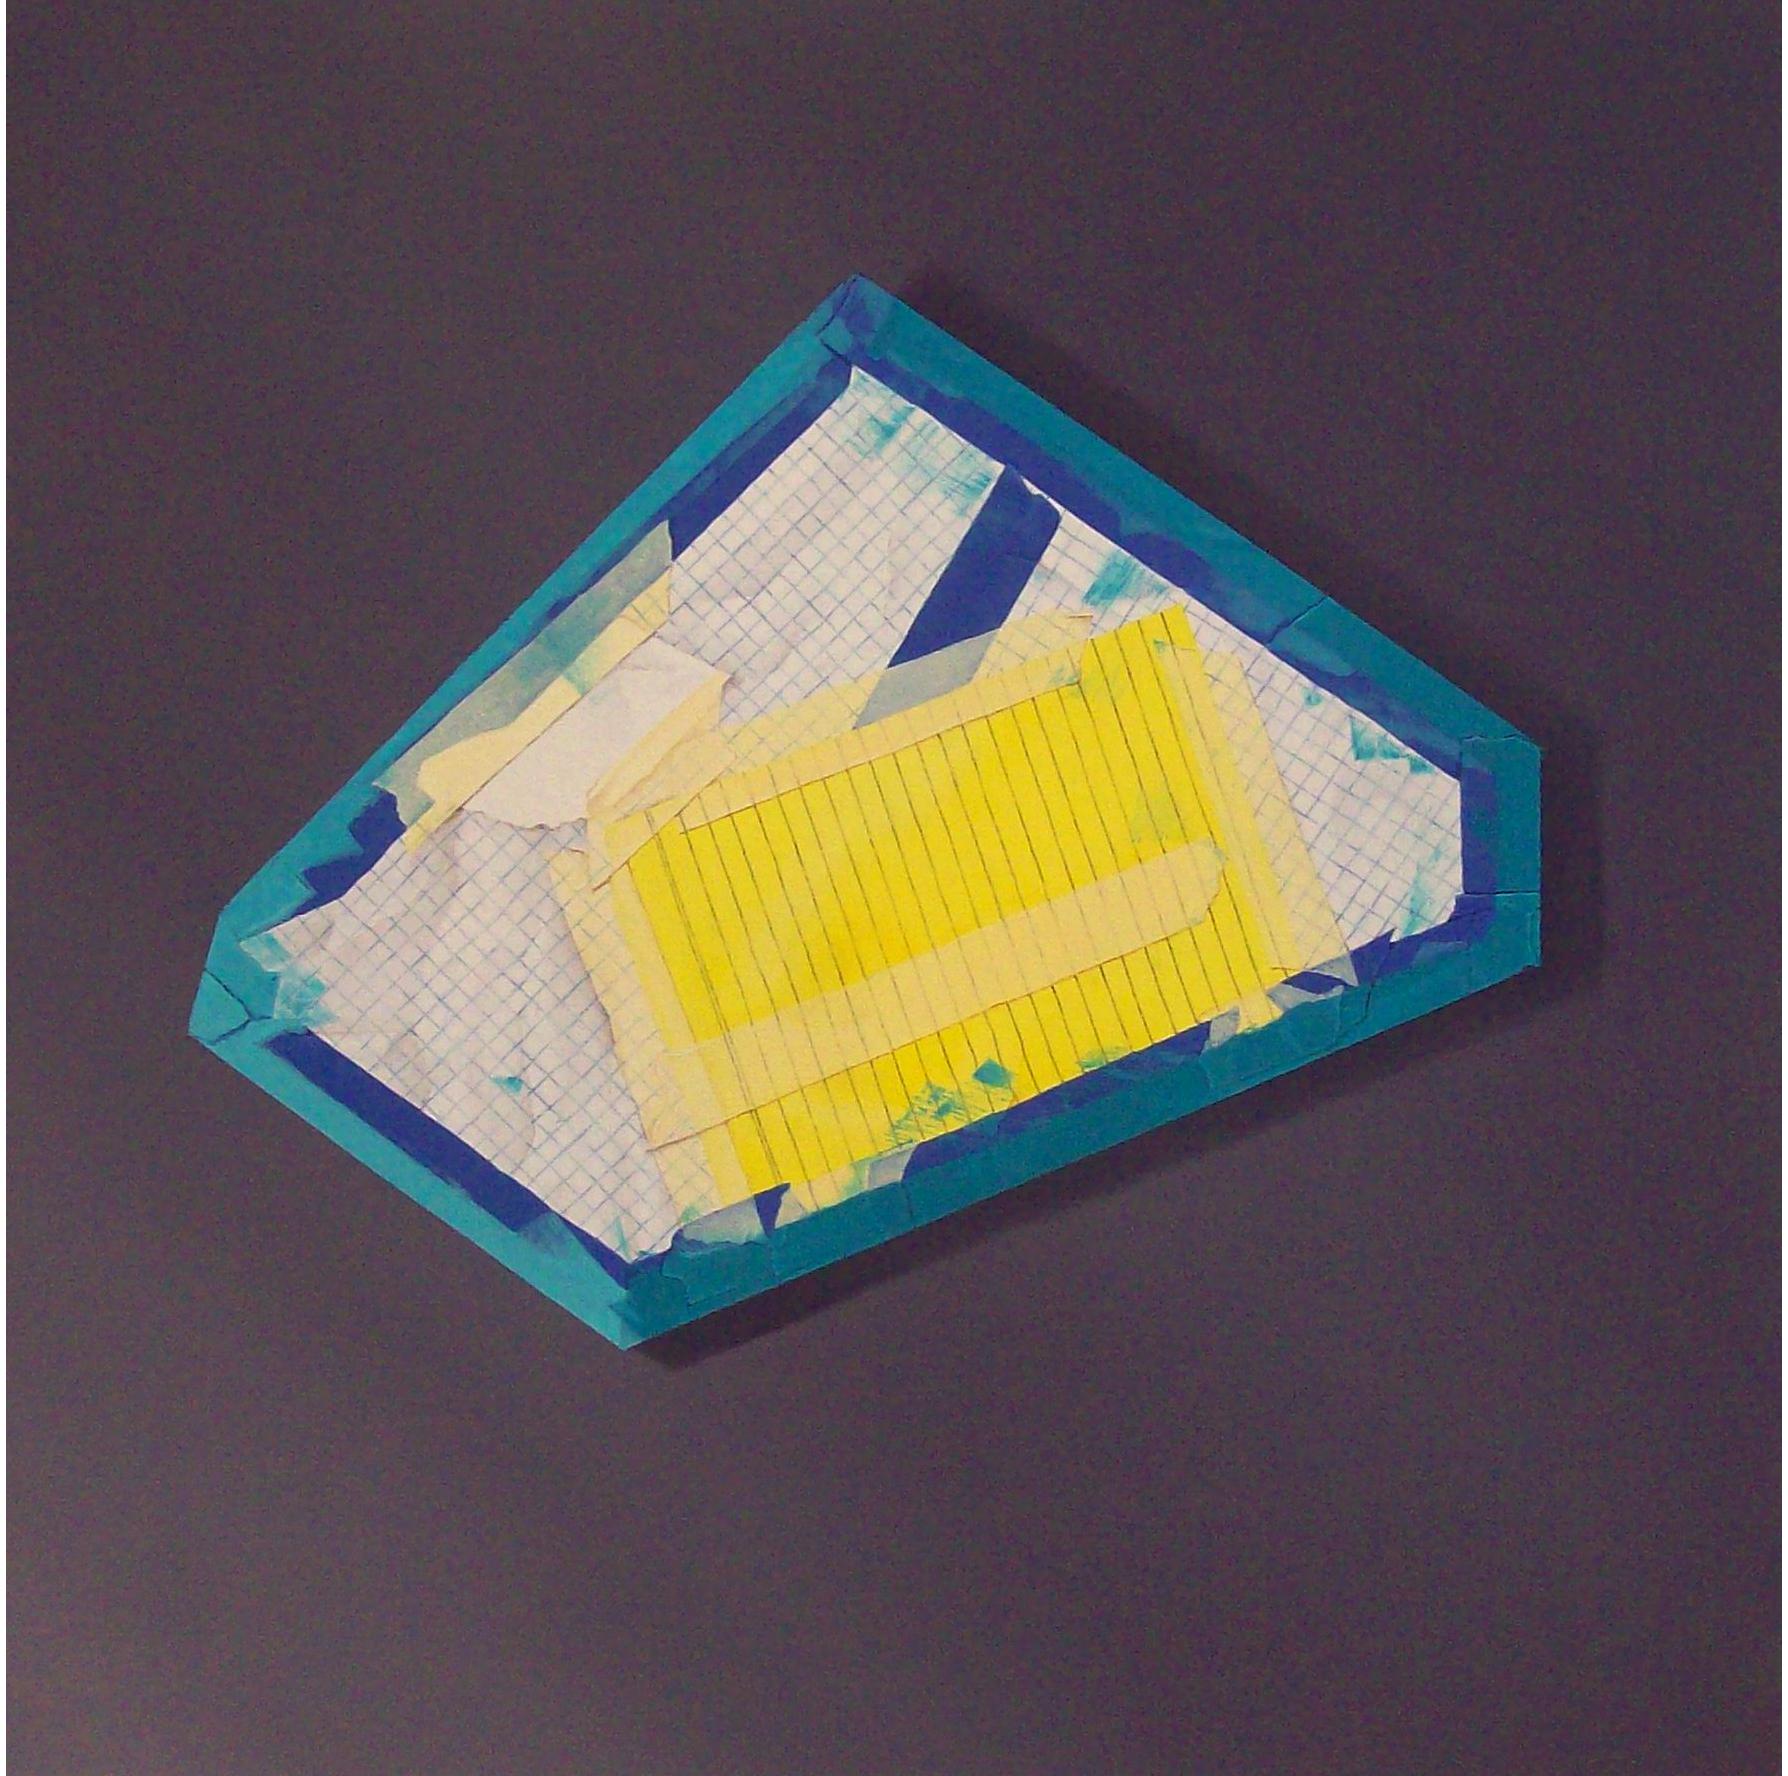 Blue Debris, oil on canvas, 2008